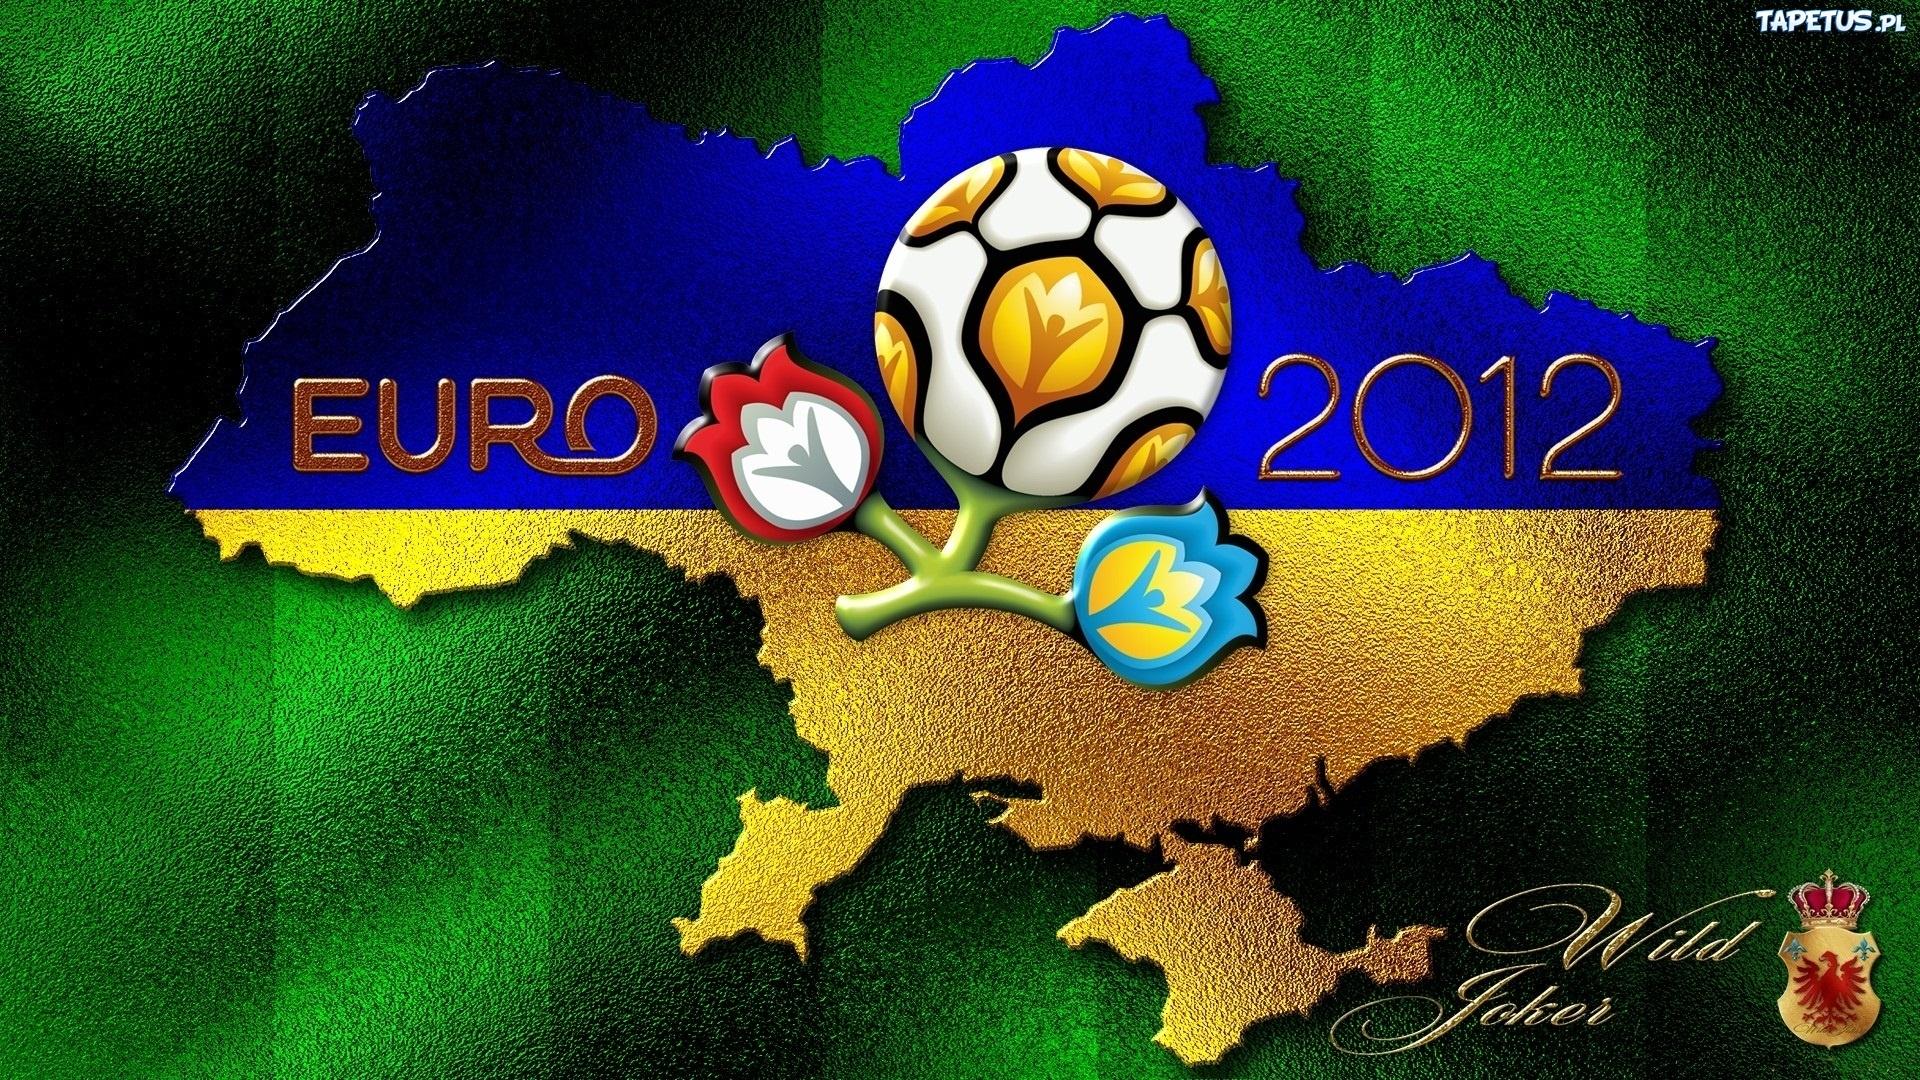 Logo uefa euro 2012 poland-ukraine смотреть